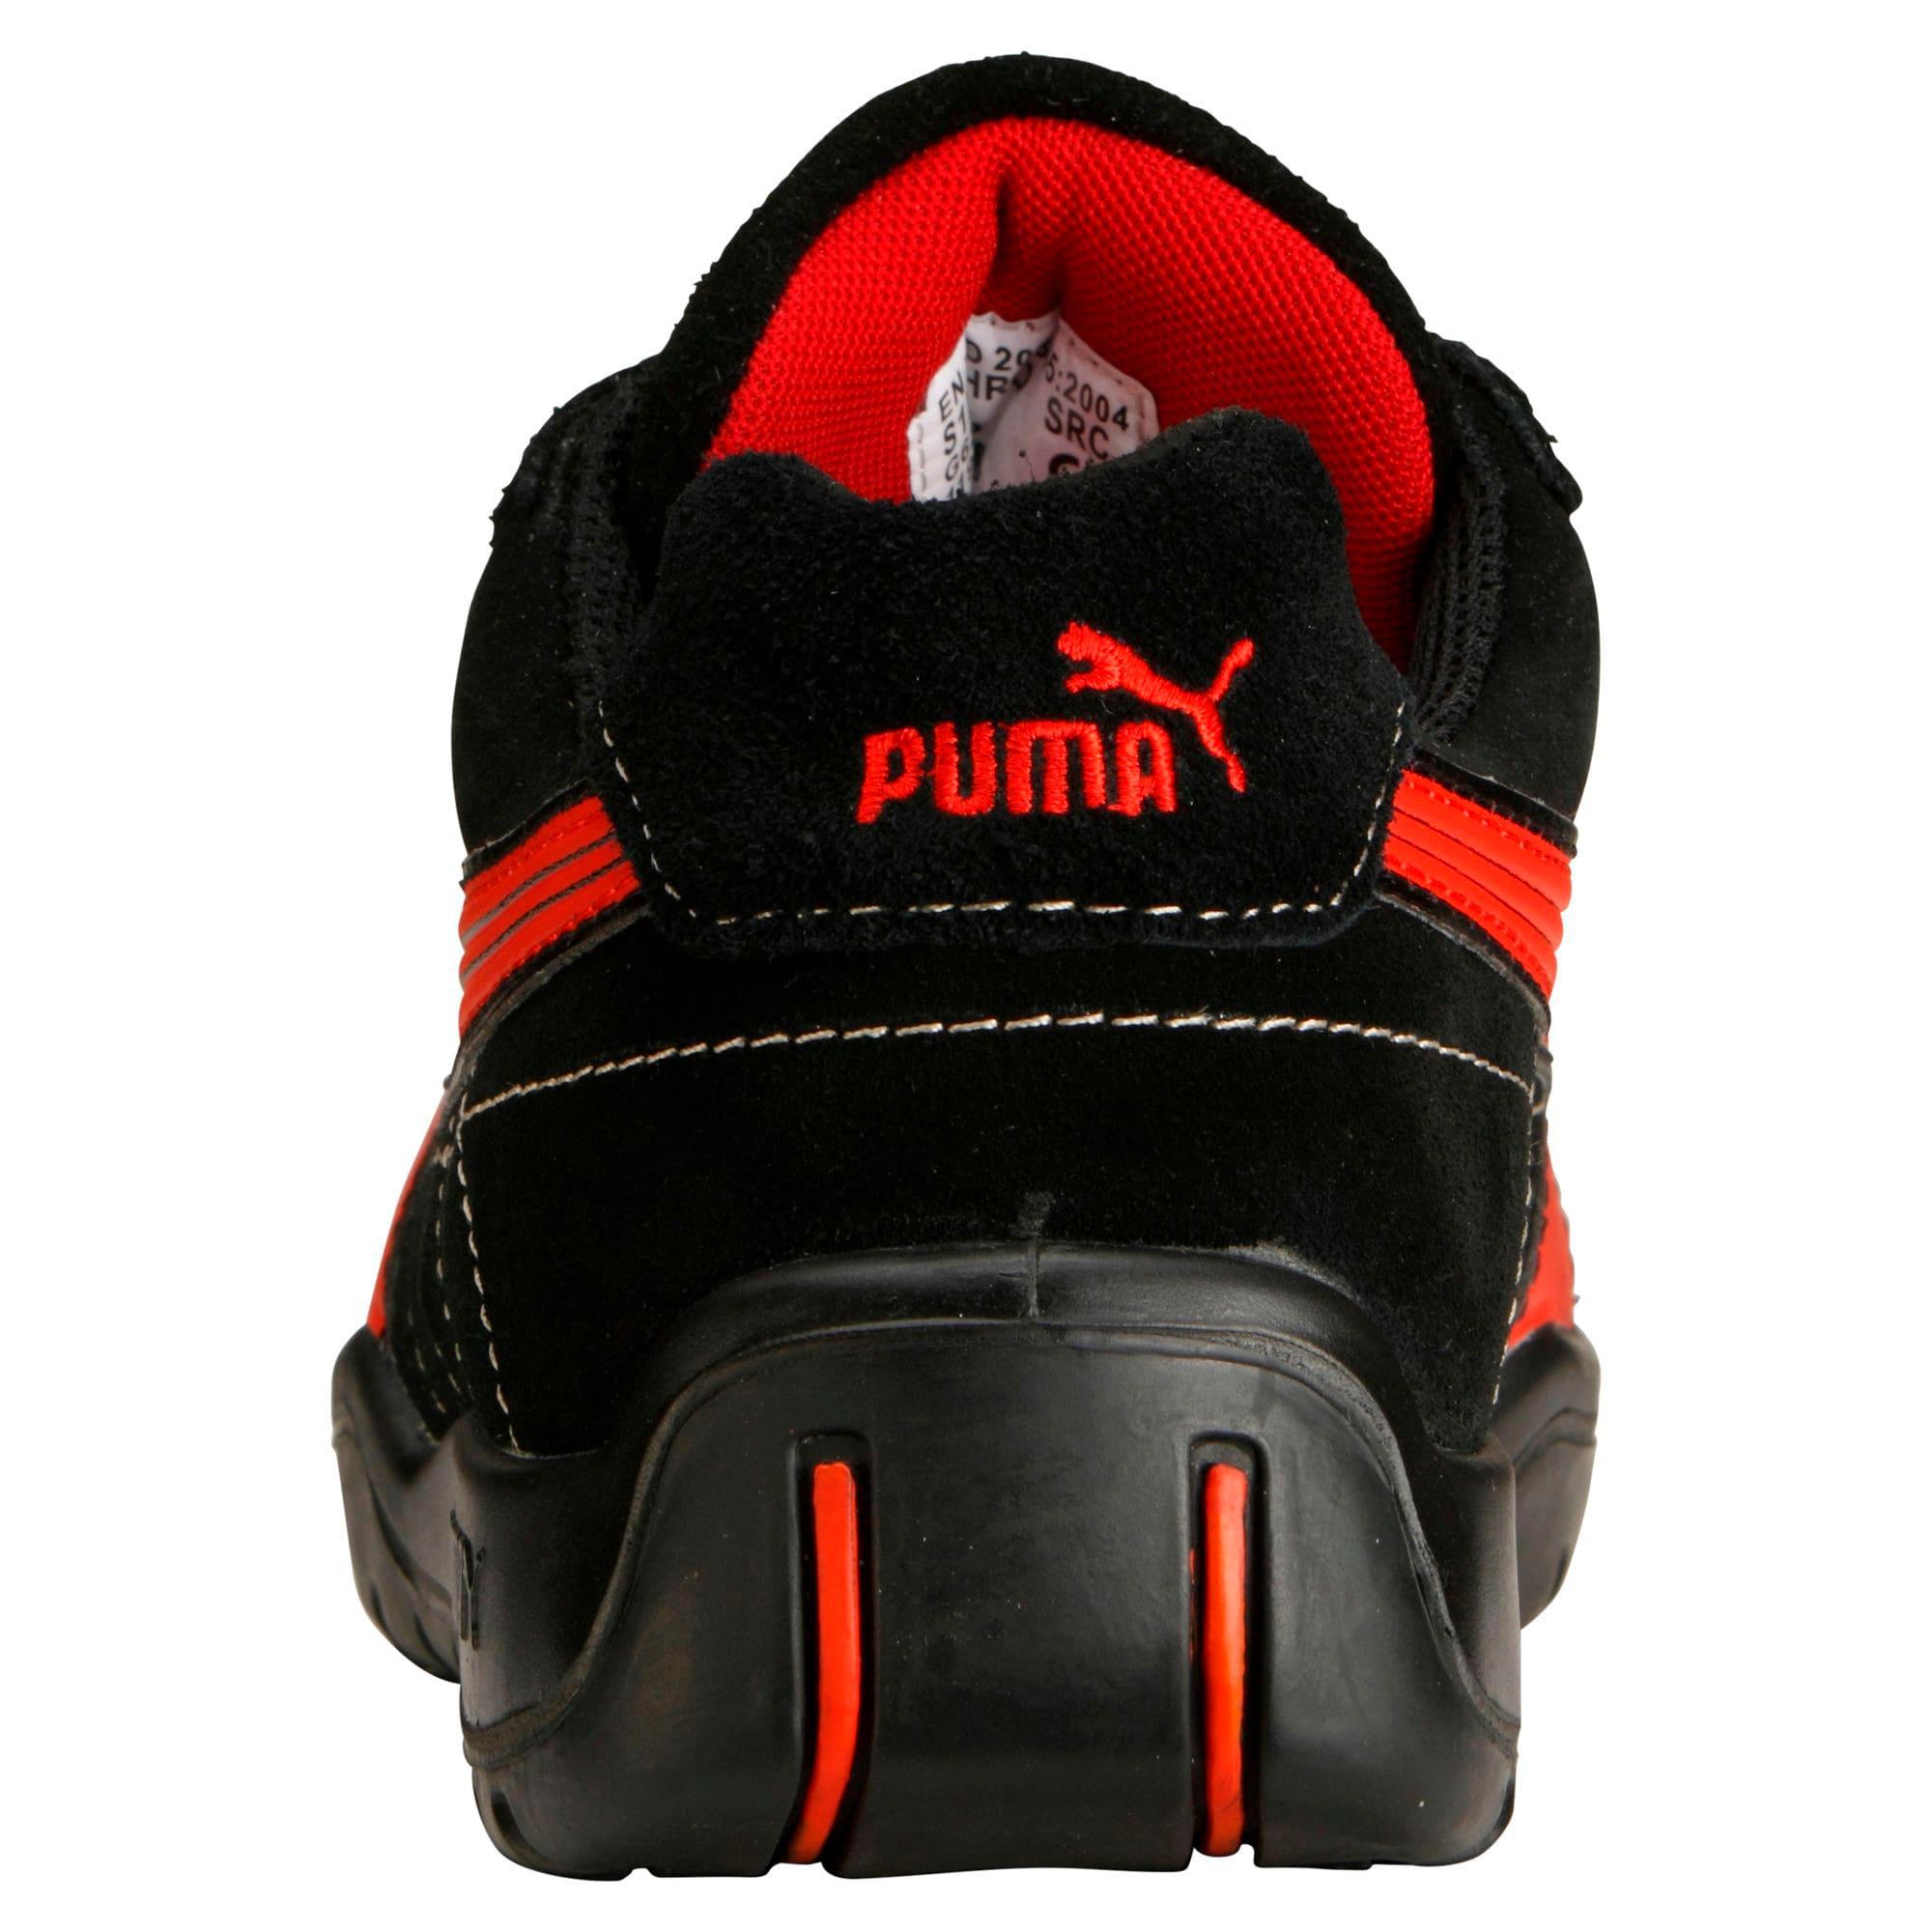 Thumbnail 3 van S1P HRO Moto Protect Safety Shoes, zwart-rood, medium